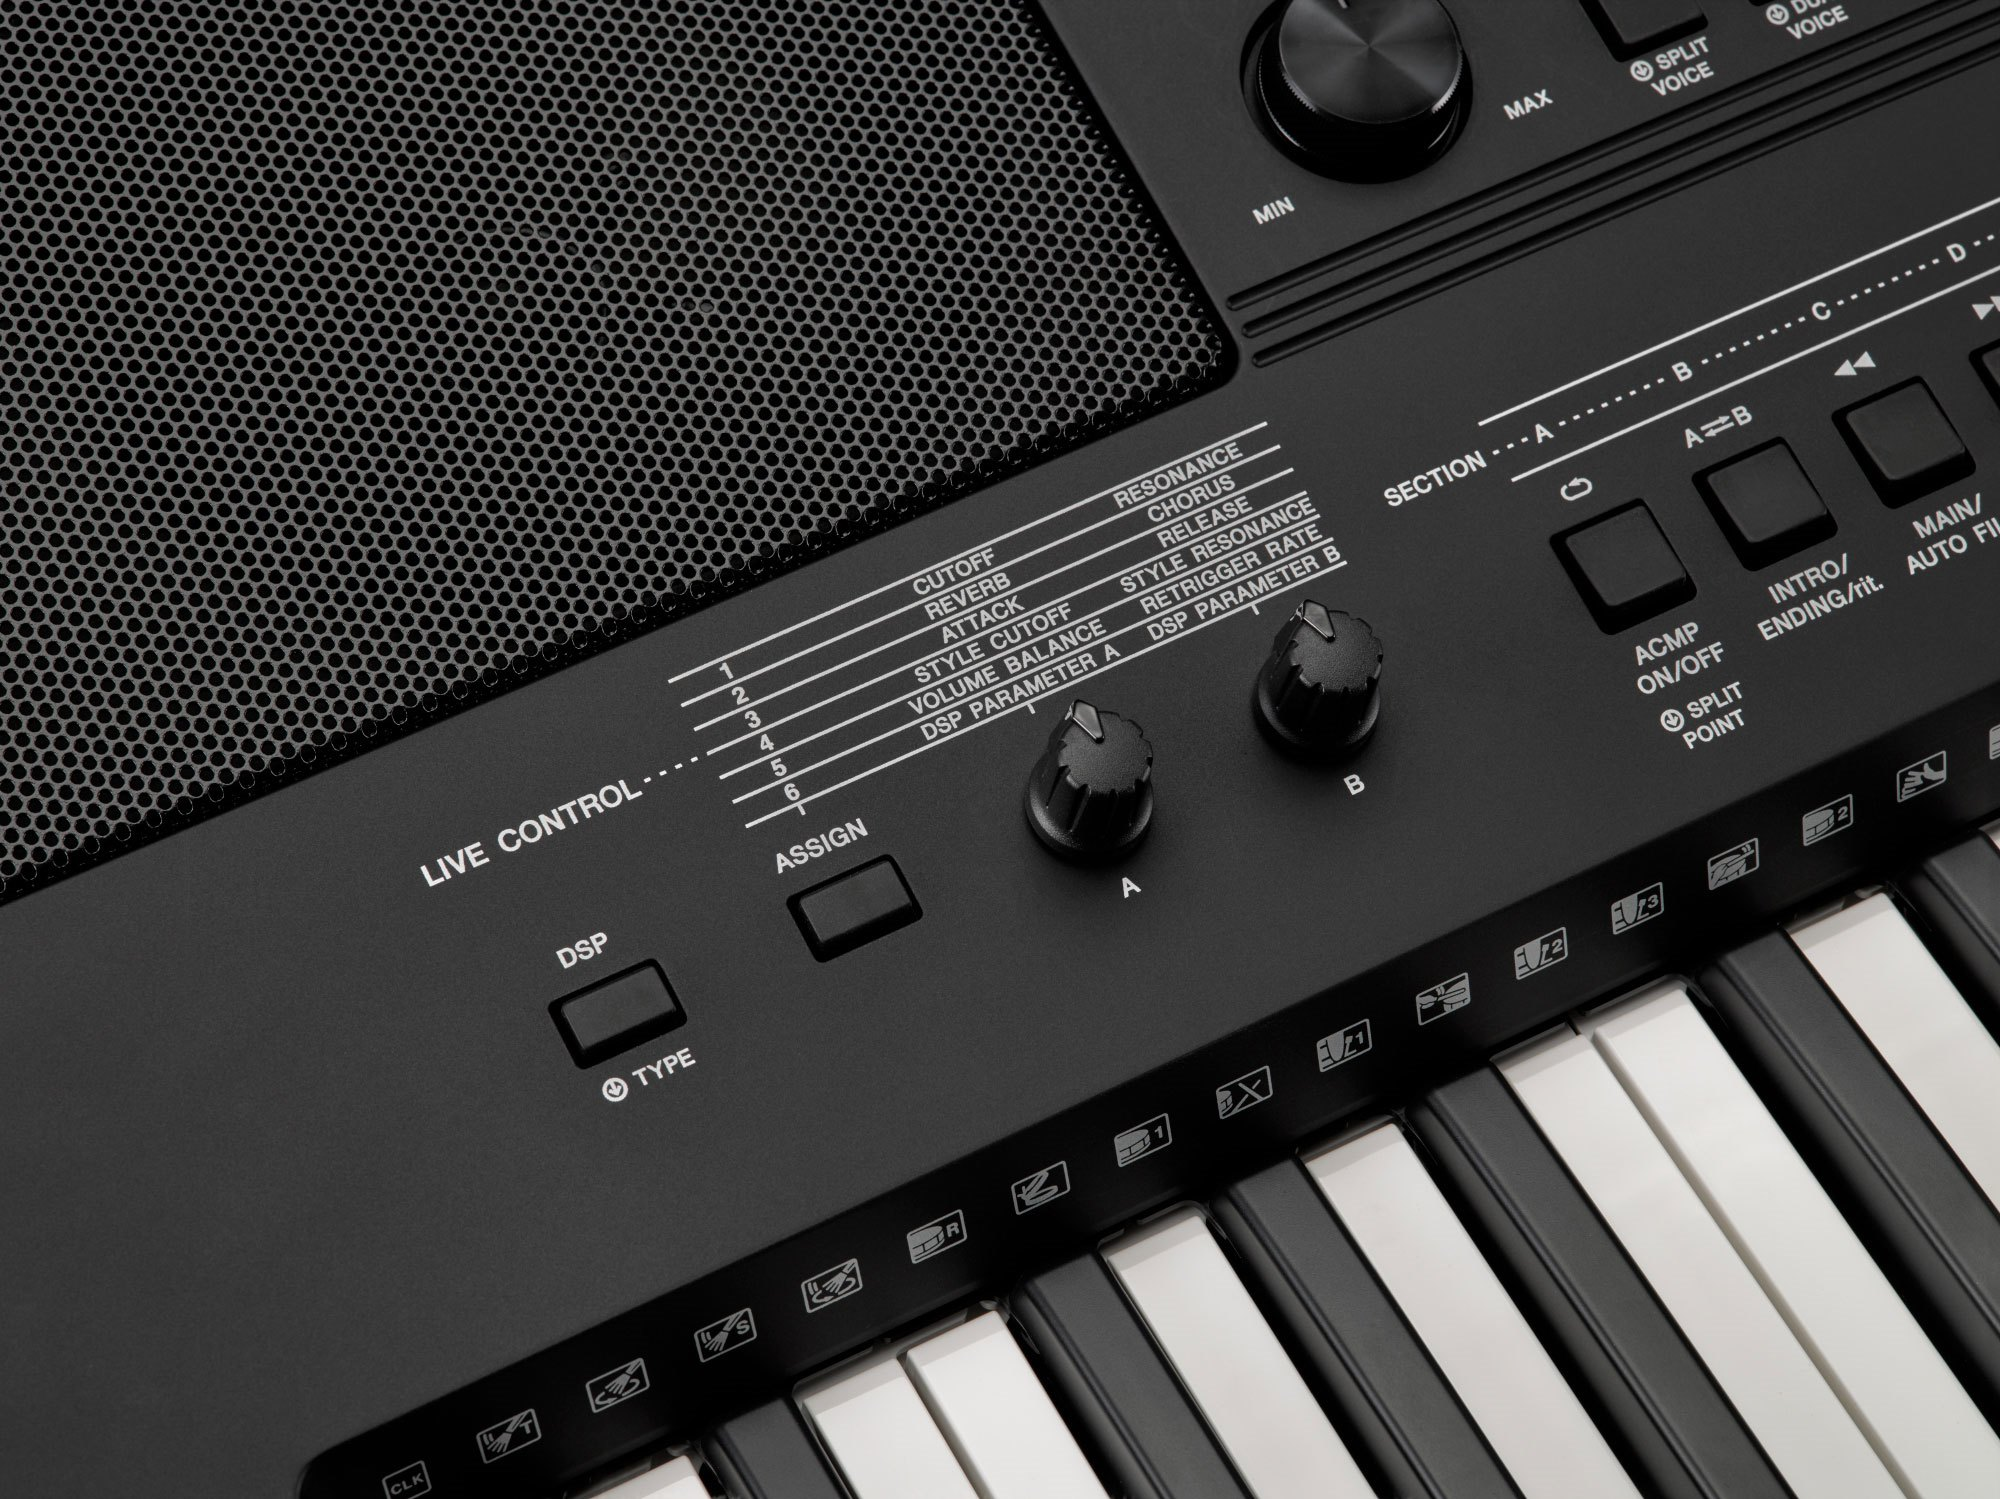 PSR-E453 - Specs - Portable Keyboards - Keyboard Instruments